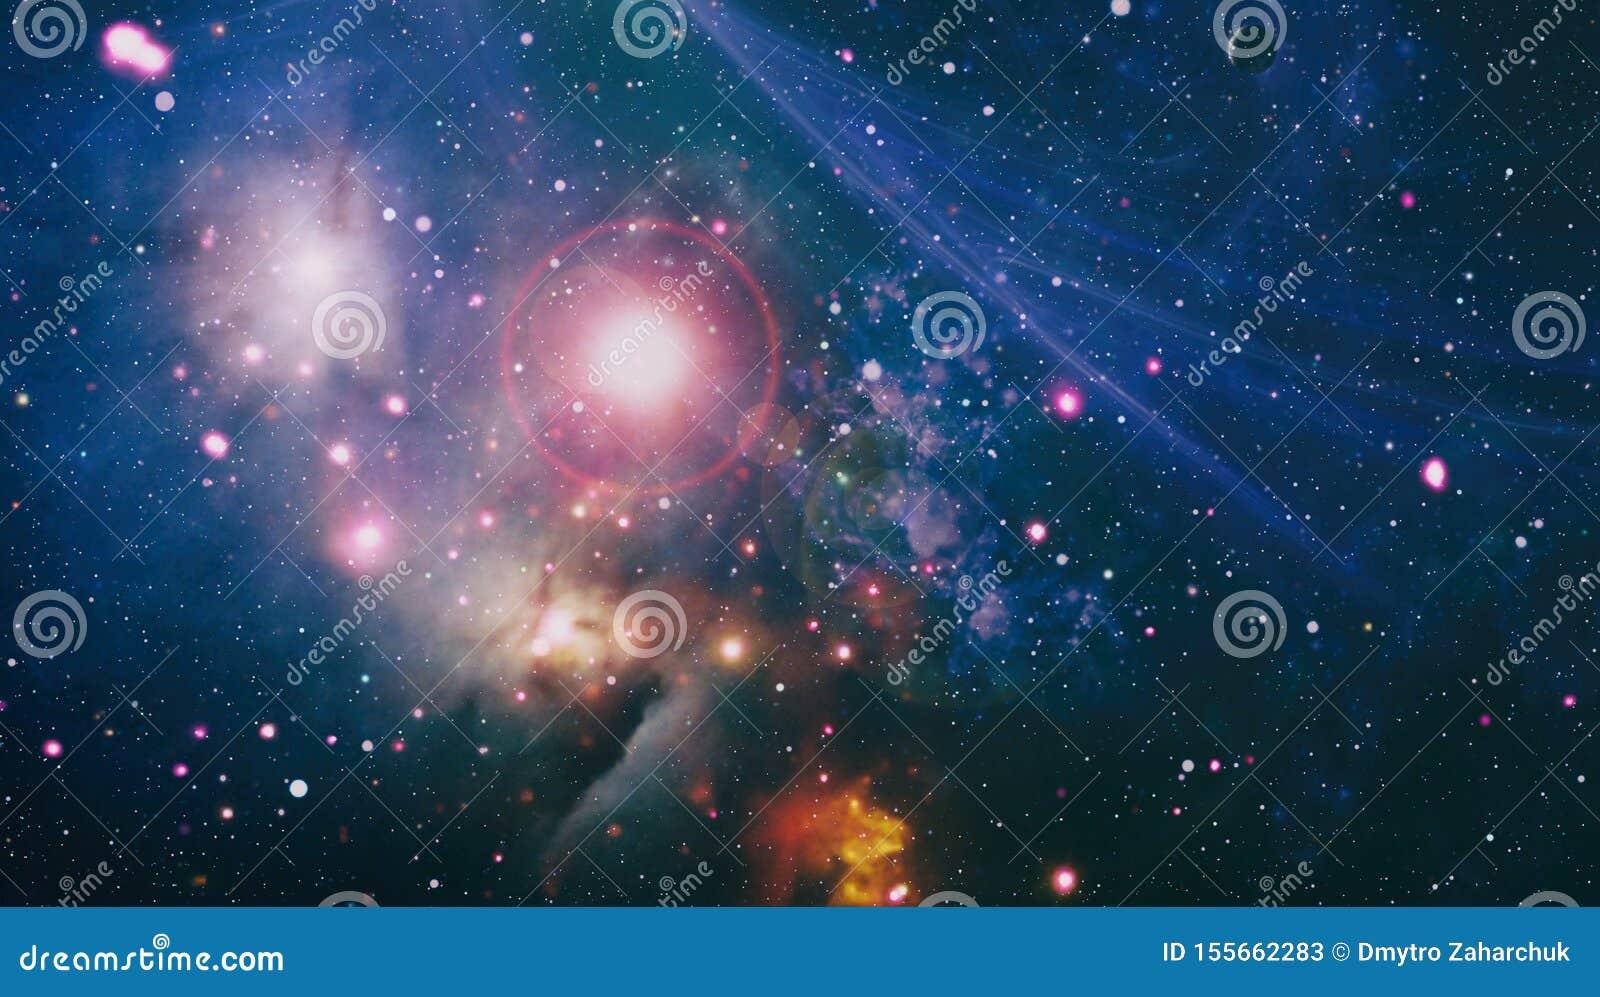 Nebula Night Starry Sky In Rainbow Colors Tar Field And Nebula In